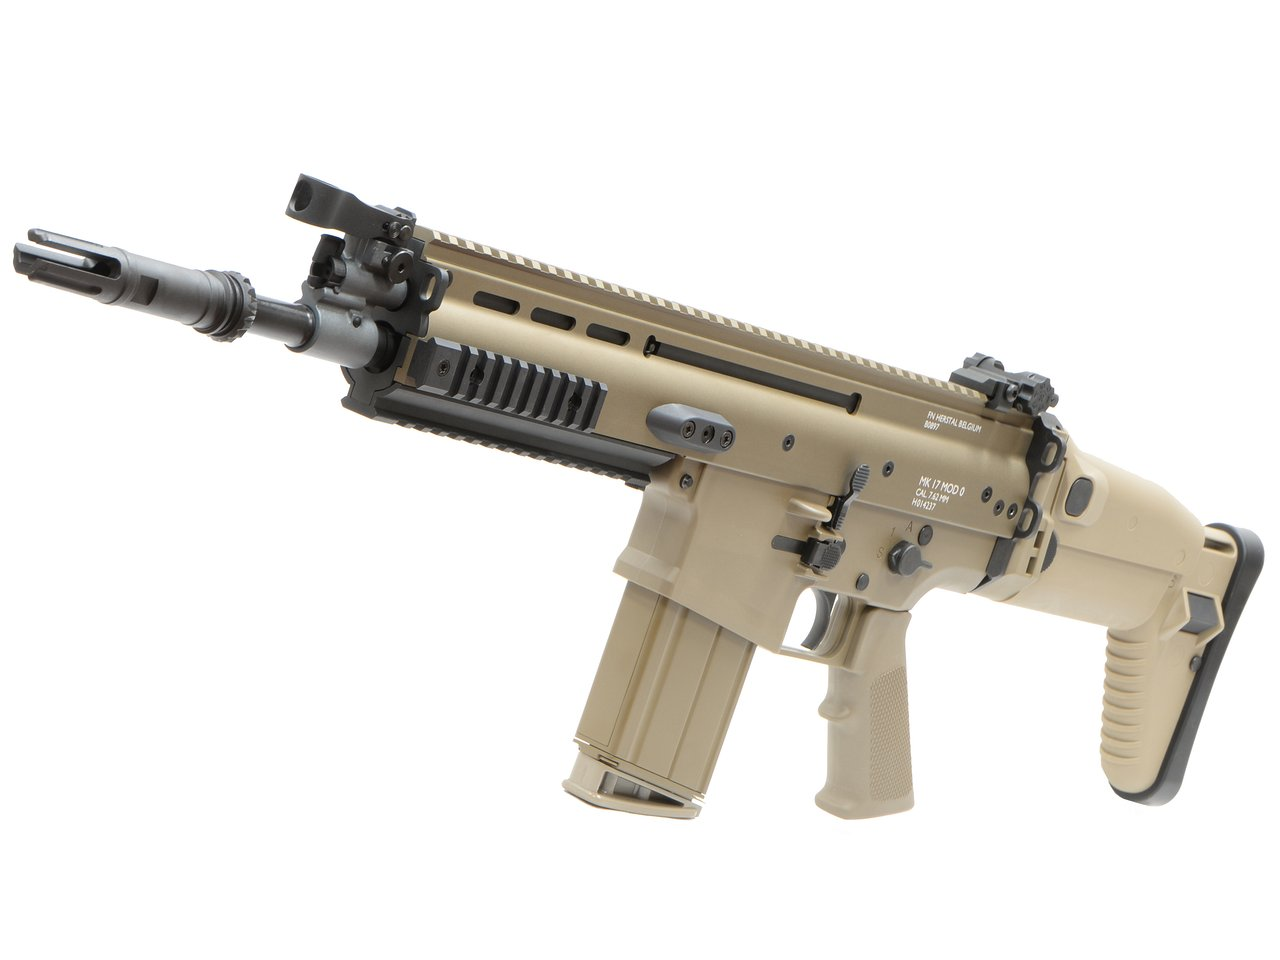 CyberGun FN SCAR-H GBBR (Mk17 JPversion) FDE